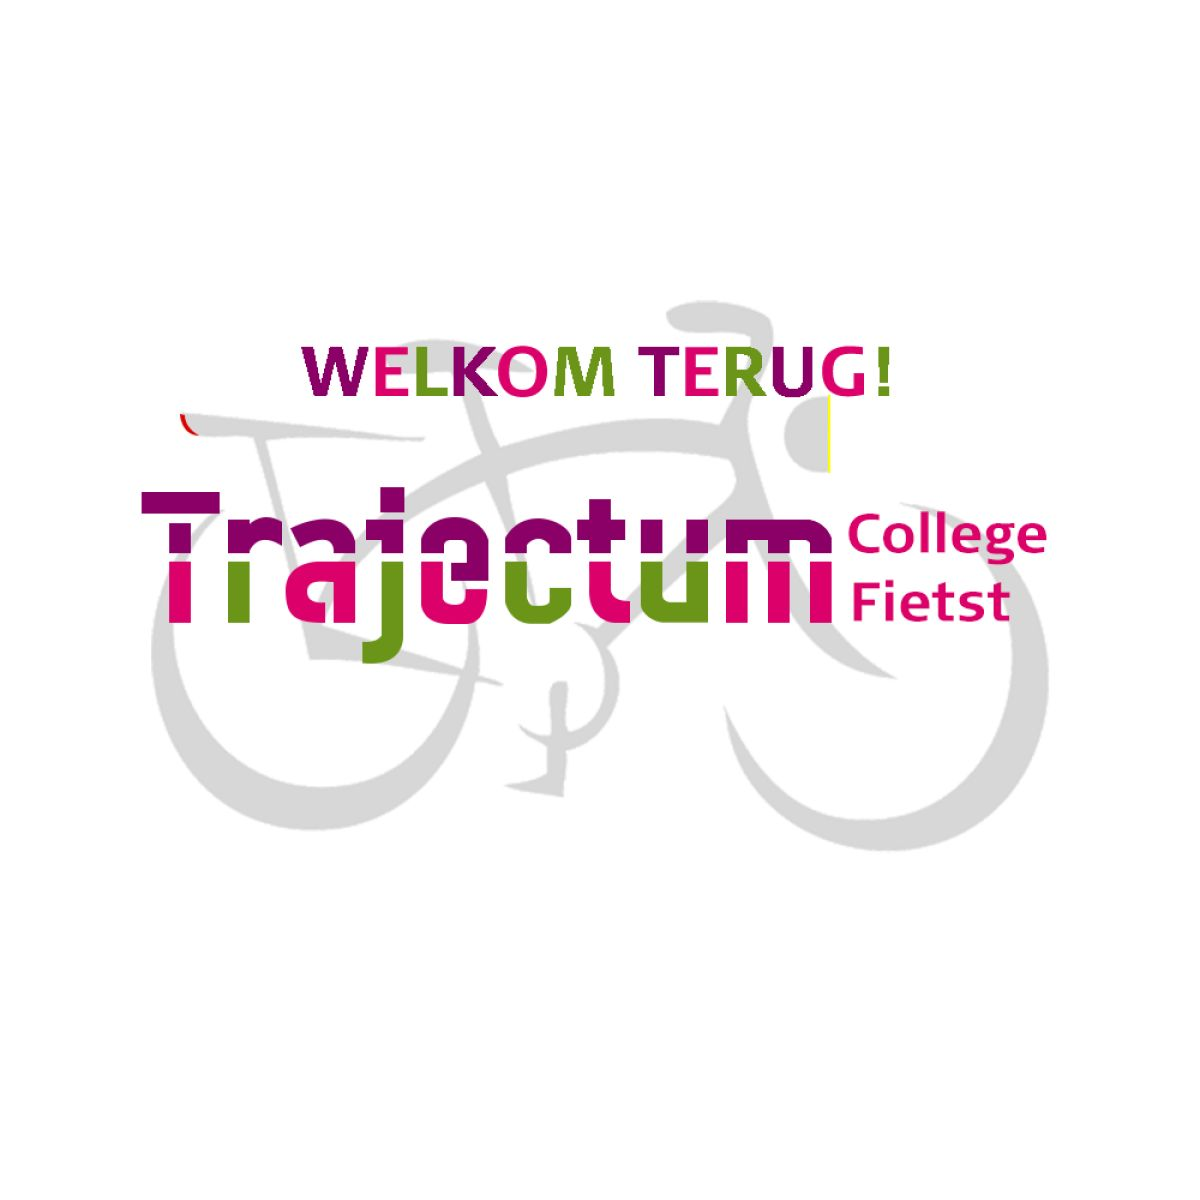 Trajectum College fietst!